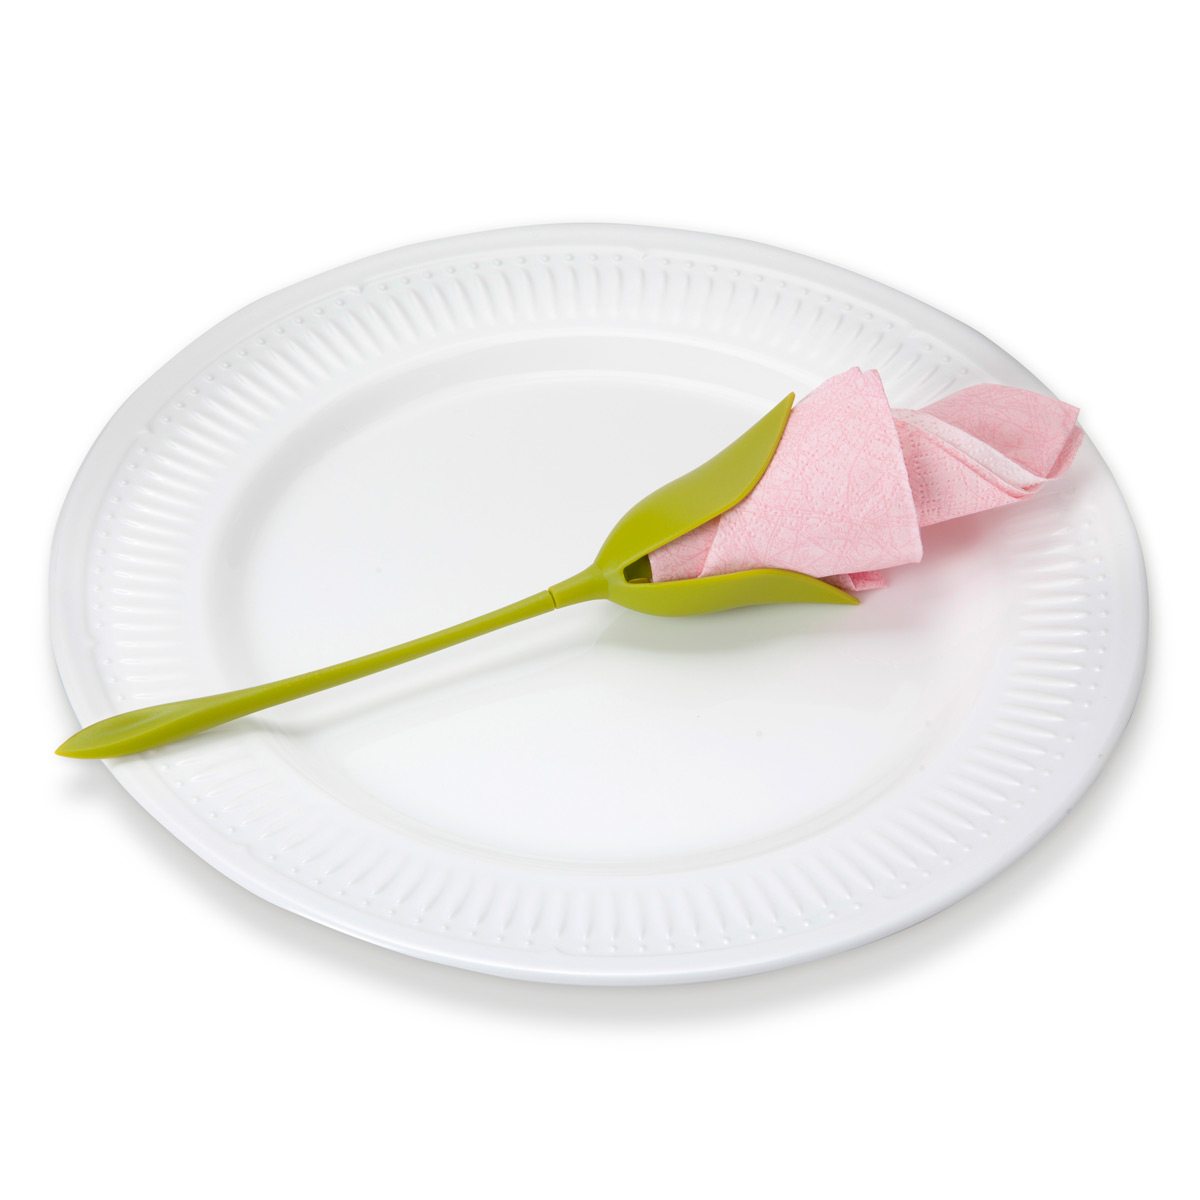 bloom napkin holders